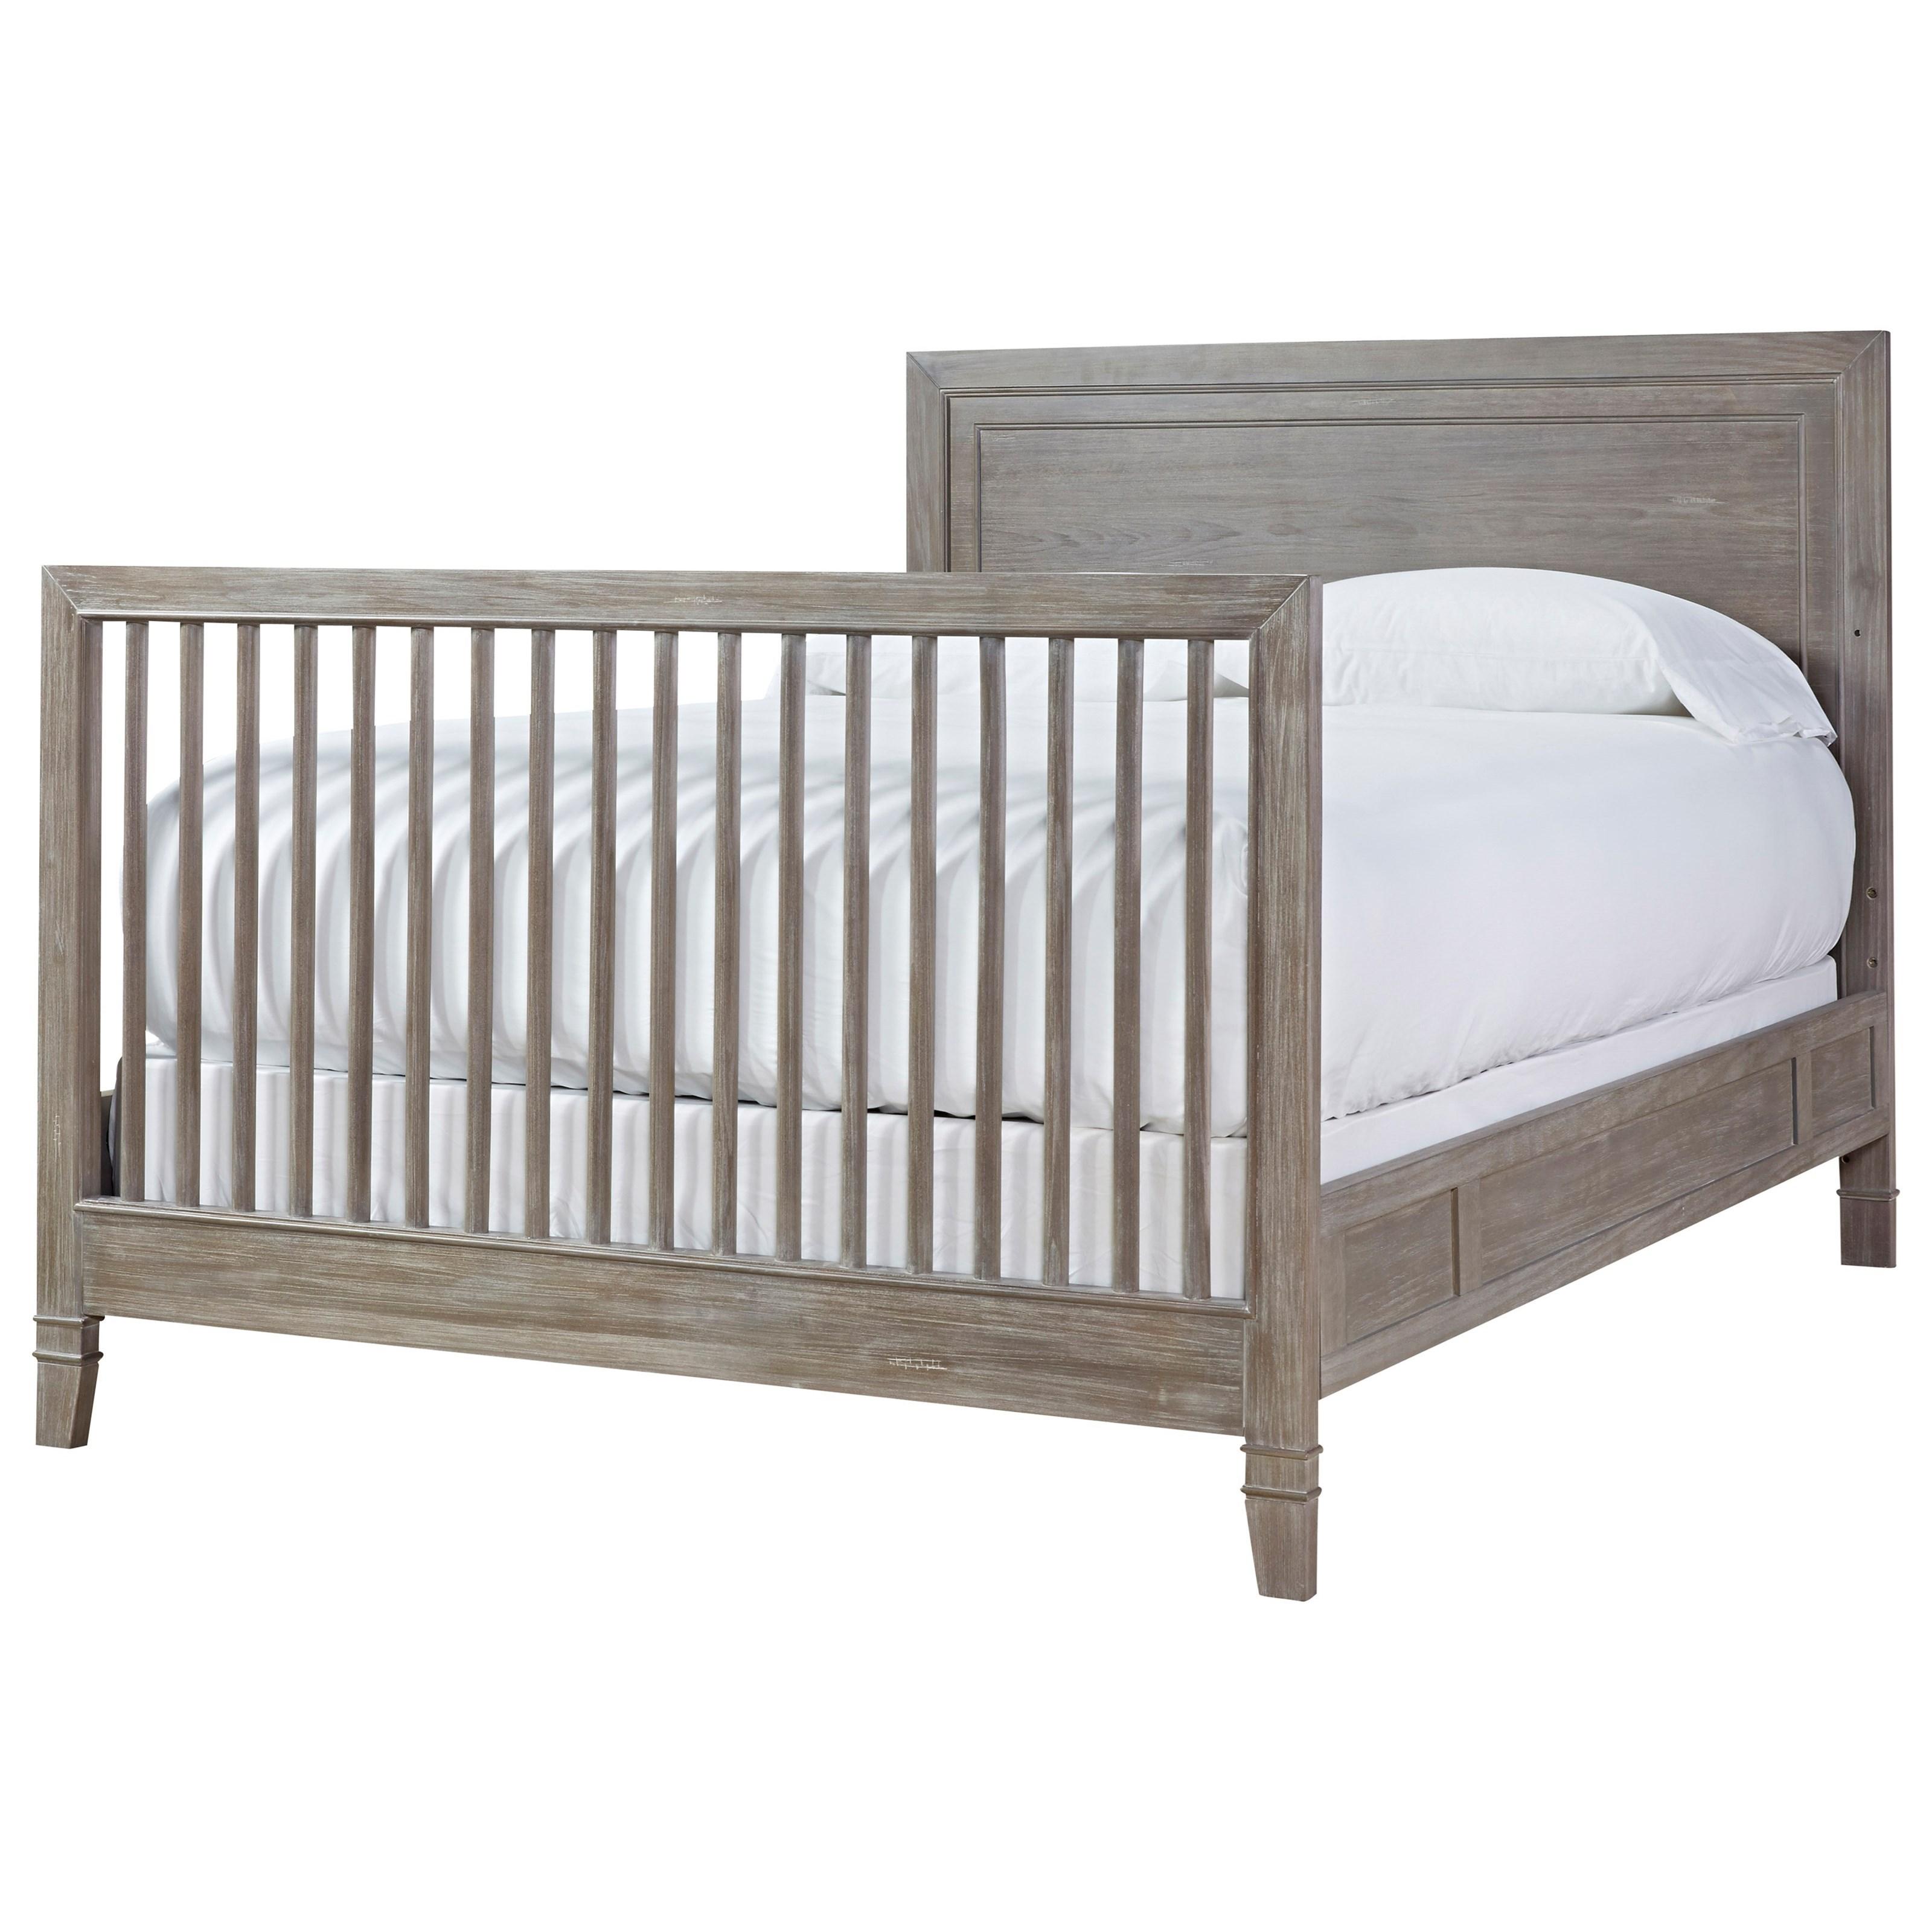 smartstuff scrimmage casual convertible crib toddler bed daybed full size bed mueller. Black Bedroom Furniture Sets. Home Design Ideas